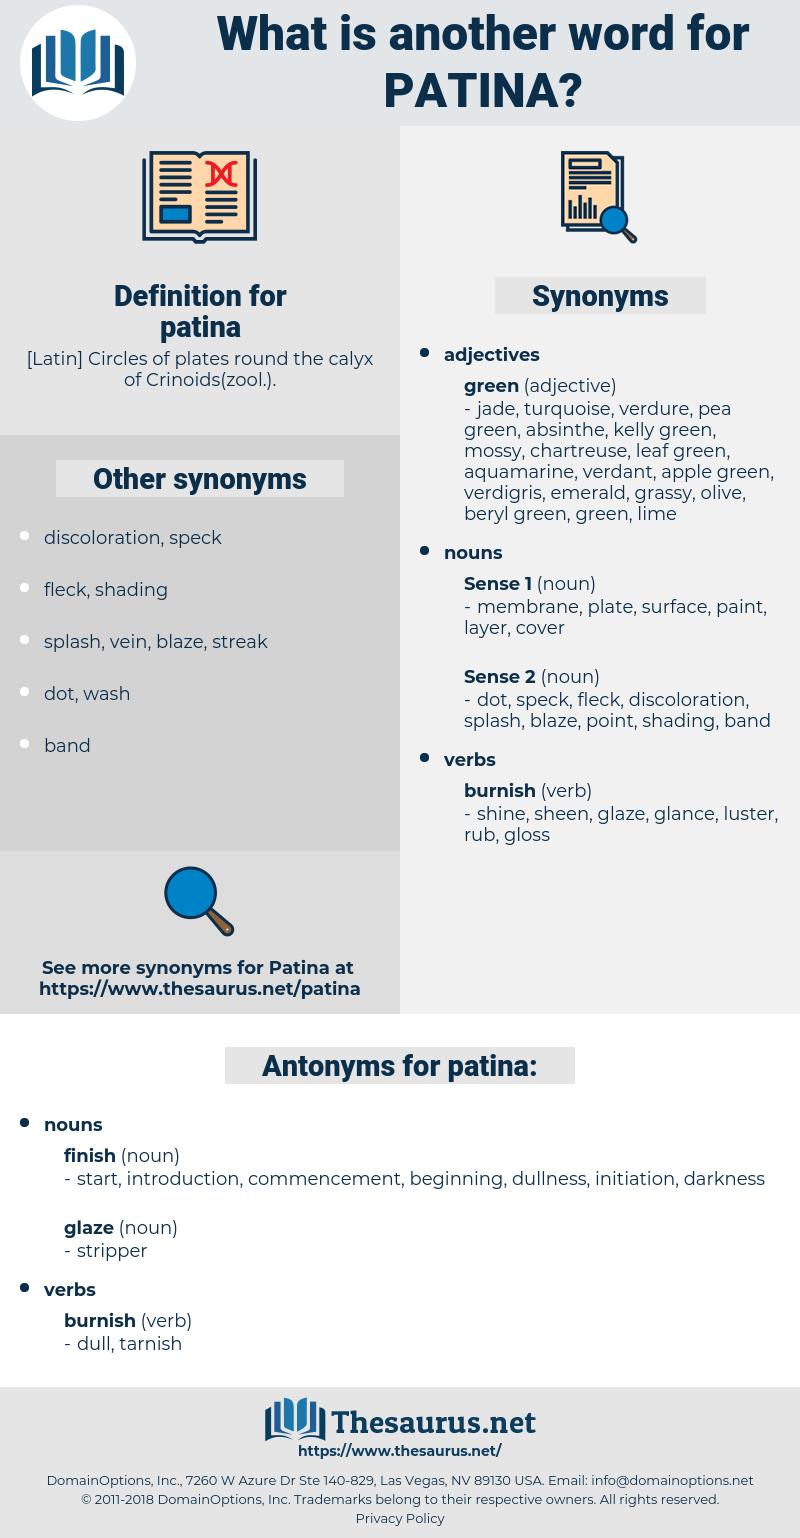 patina, synonym patina, another word for patina, words like patina, thesaurus patina